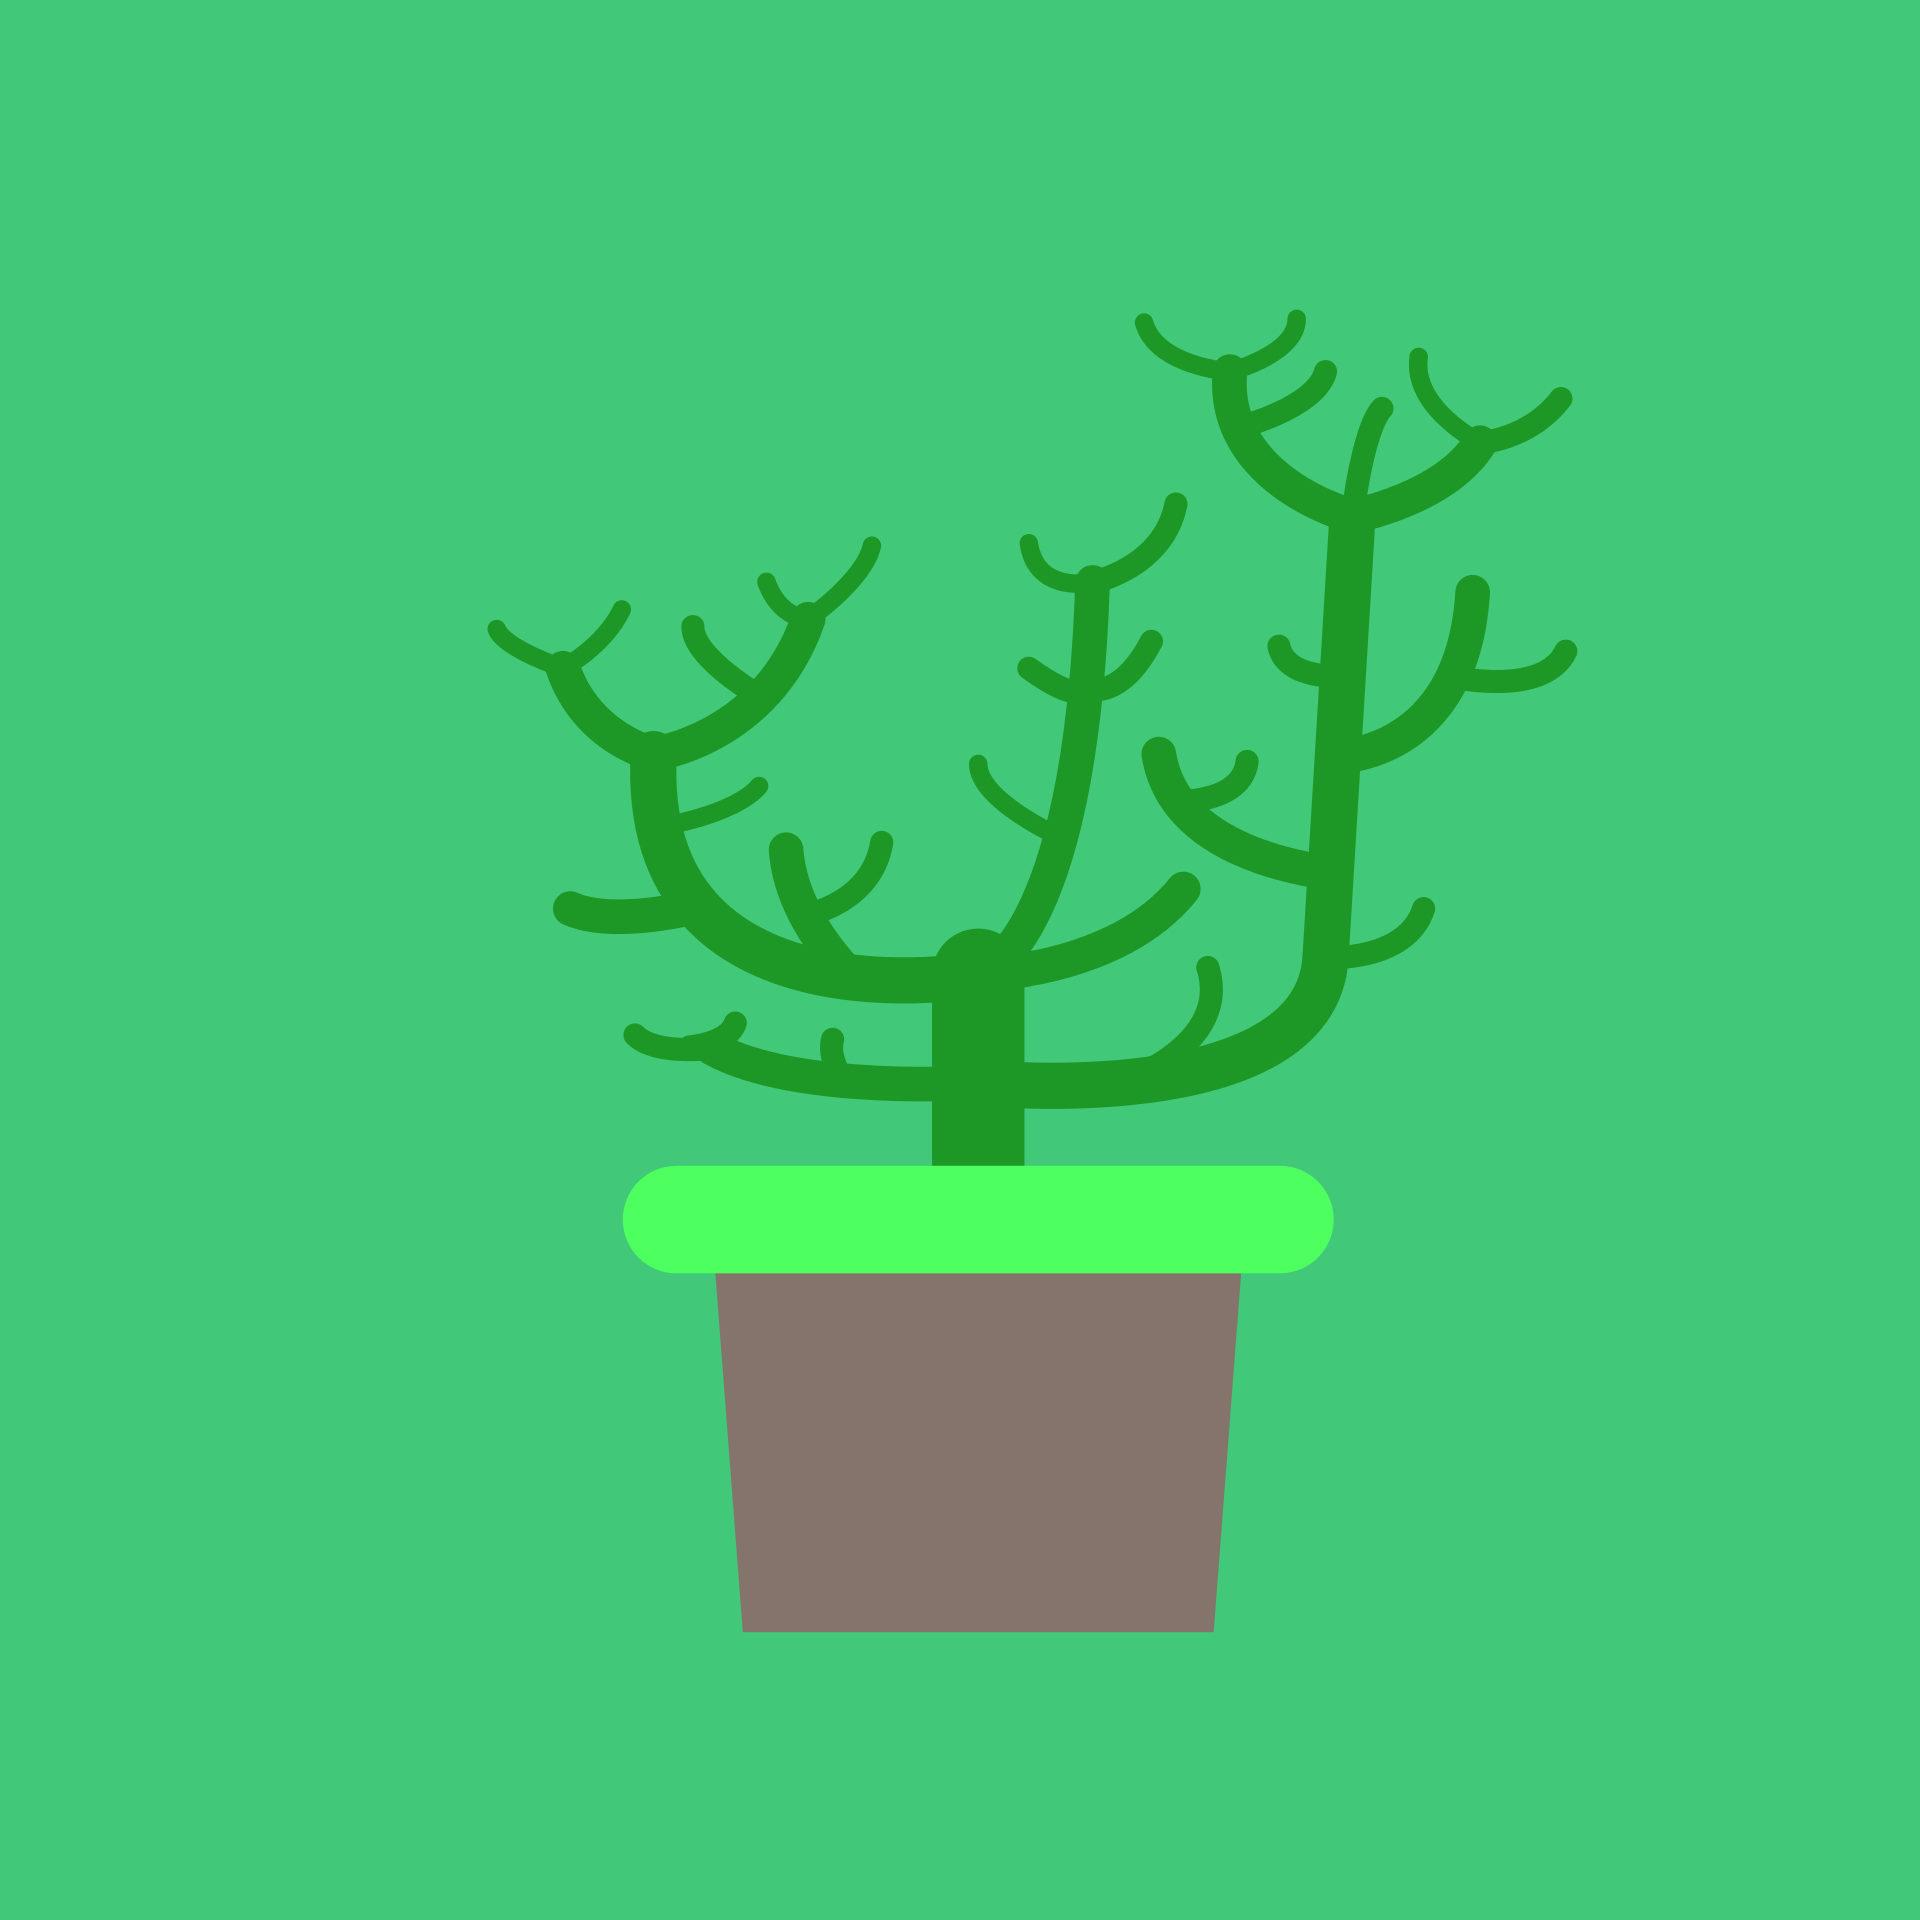 piano terra, pentola, Cactus, Verde, Brown - Sfondi HD - Professor-falken.com